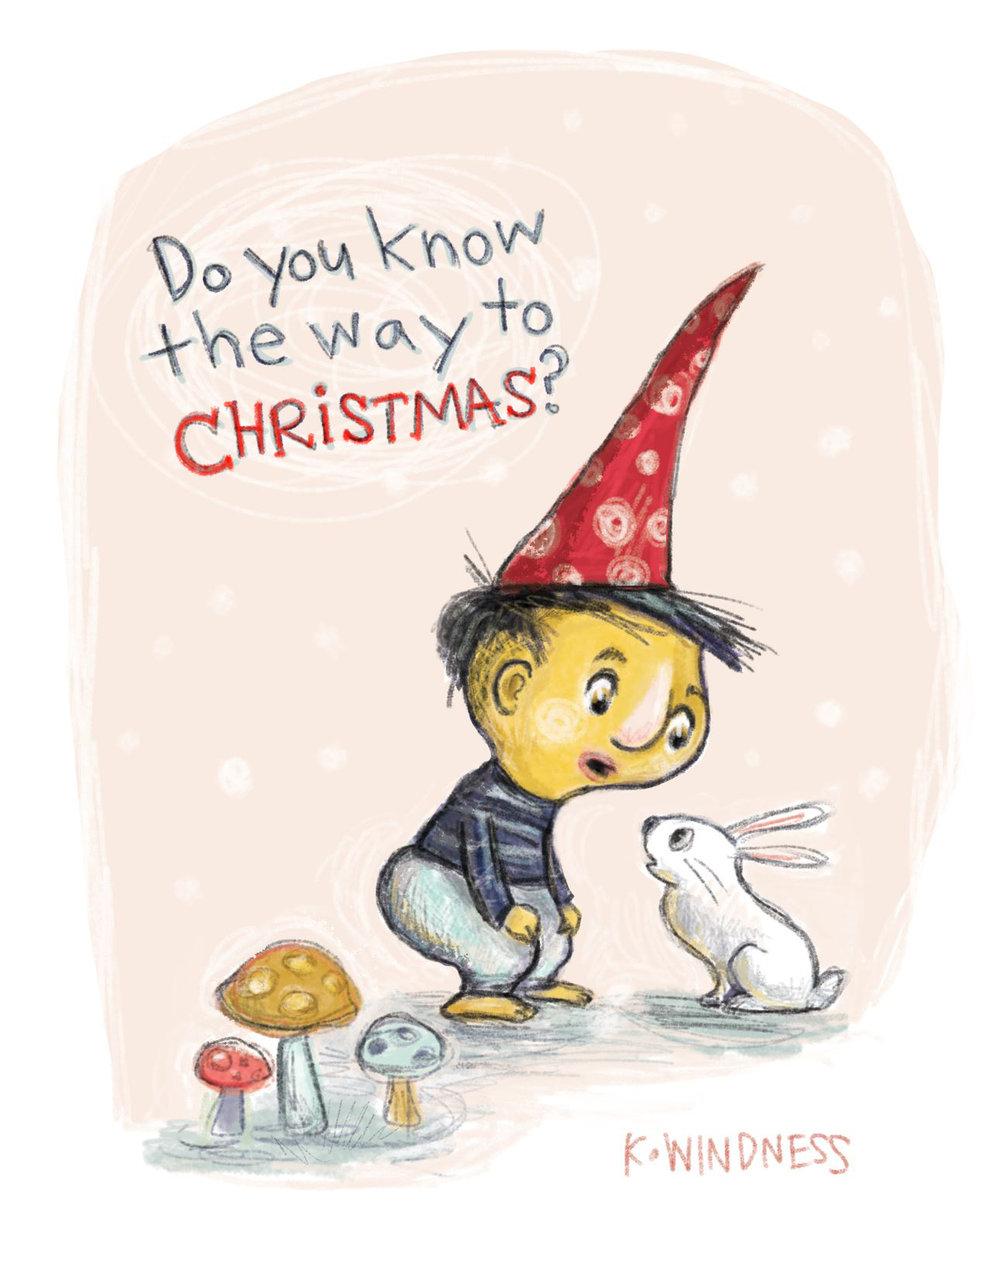 gnome-christmas-windness.jpg